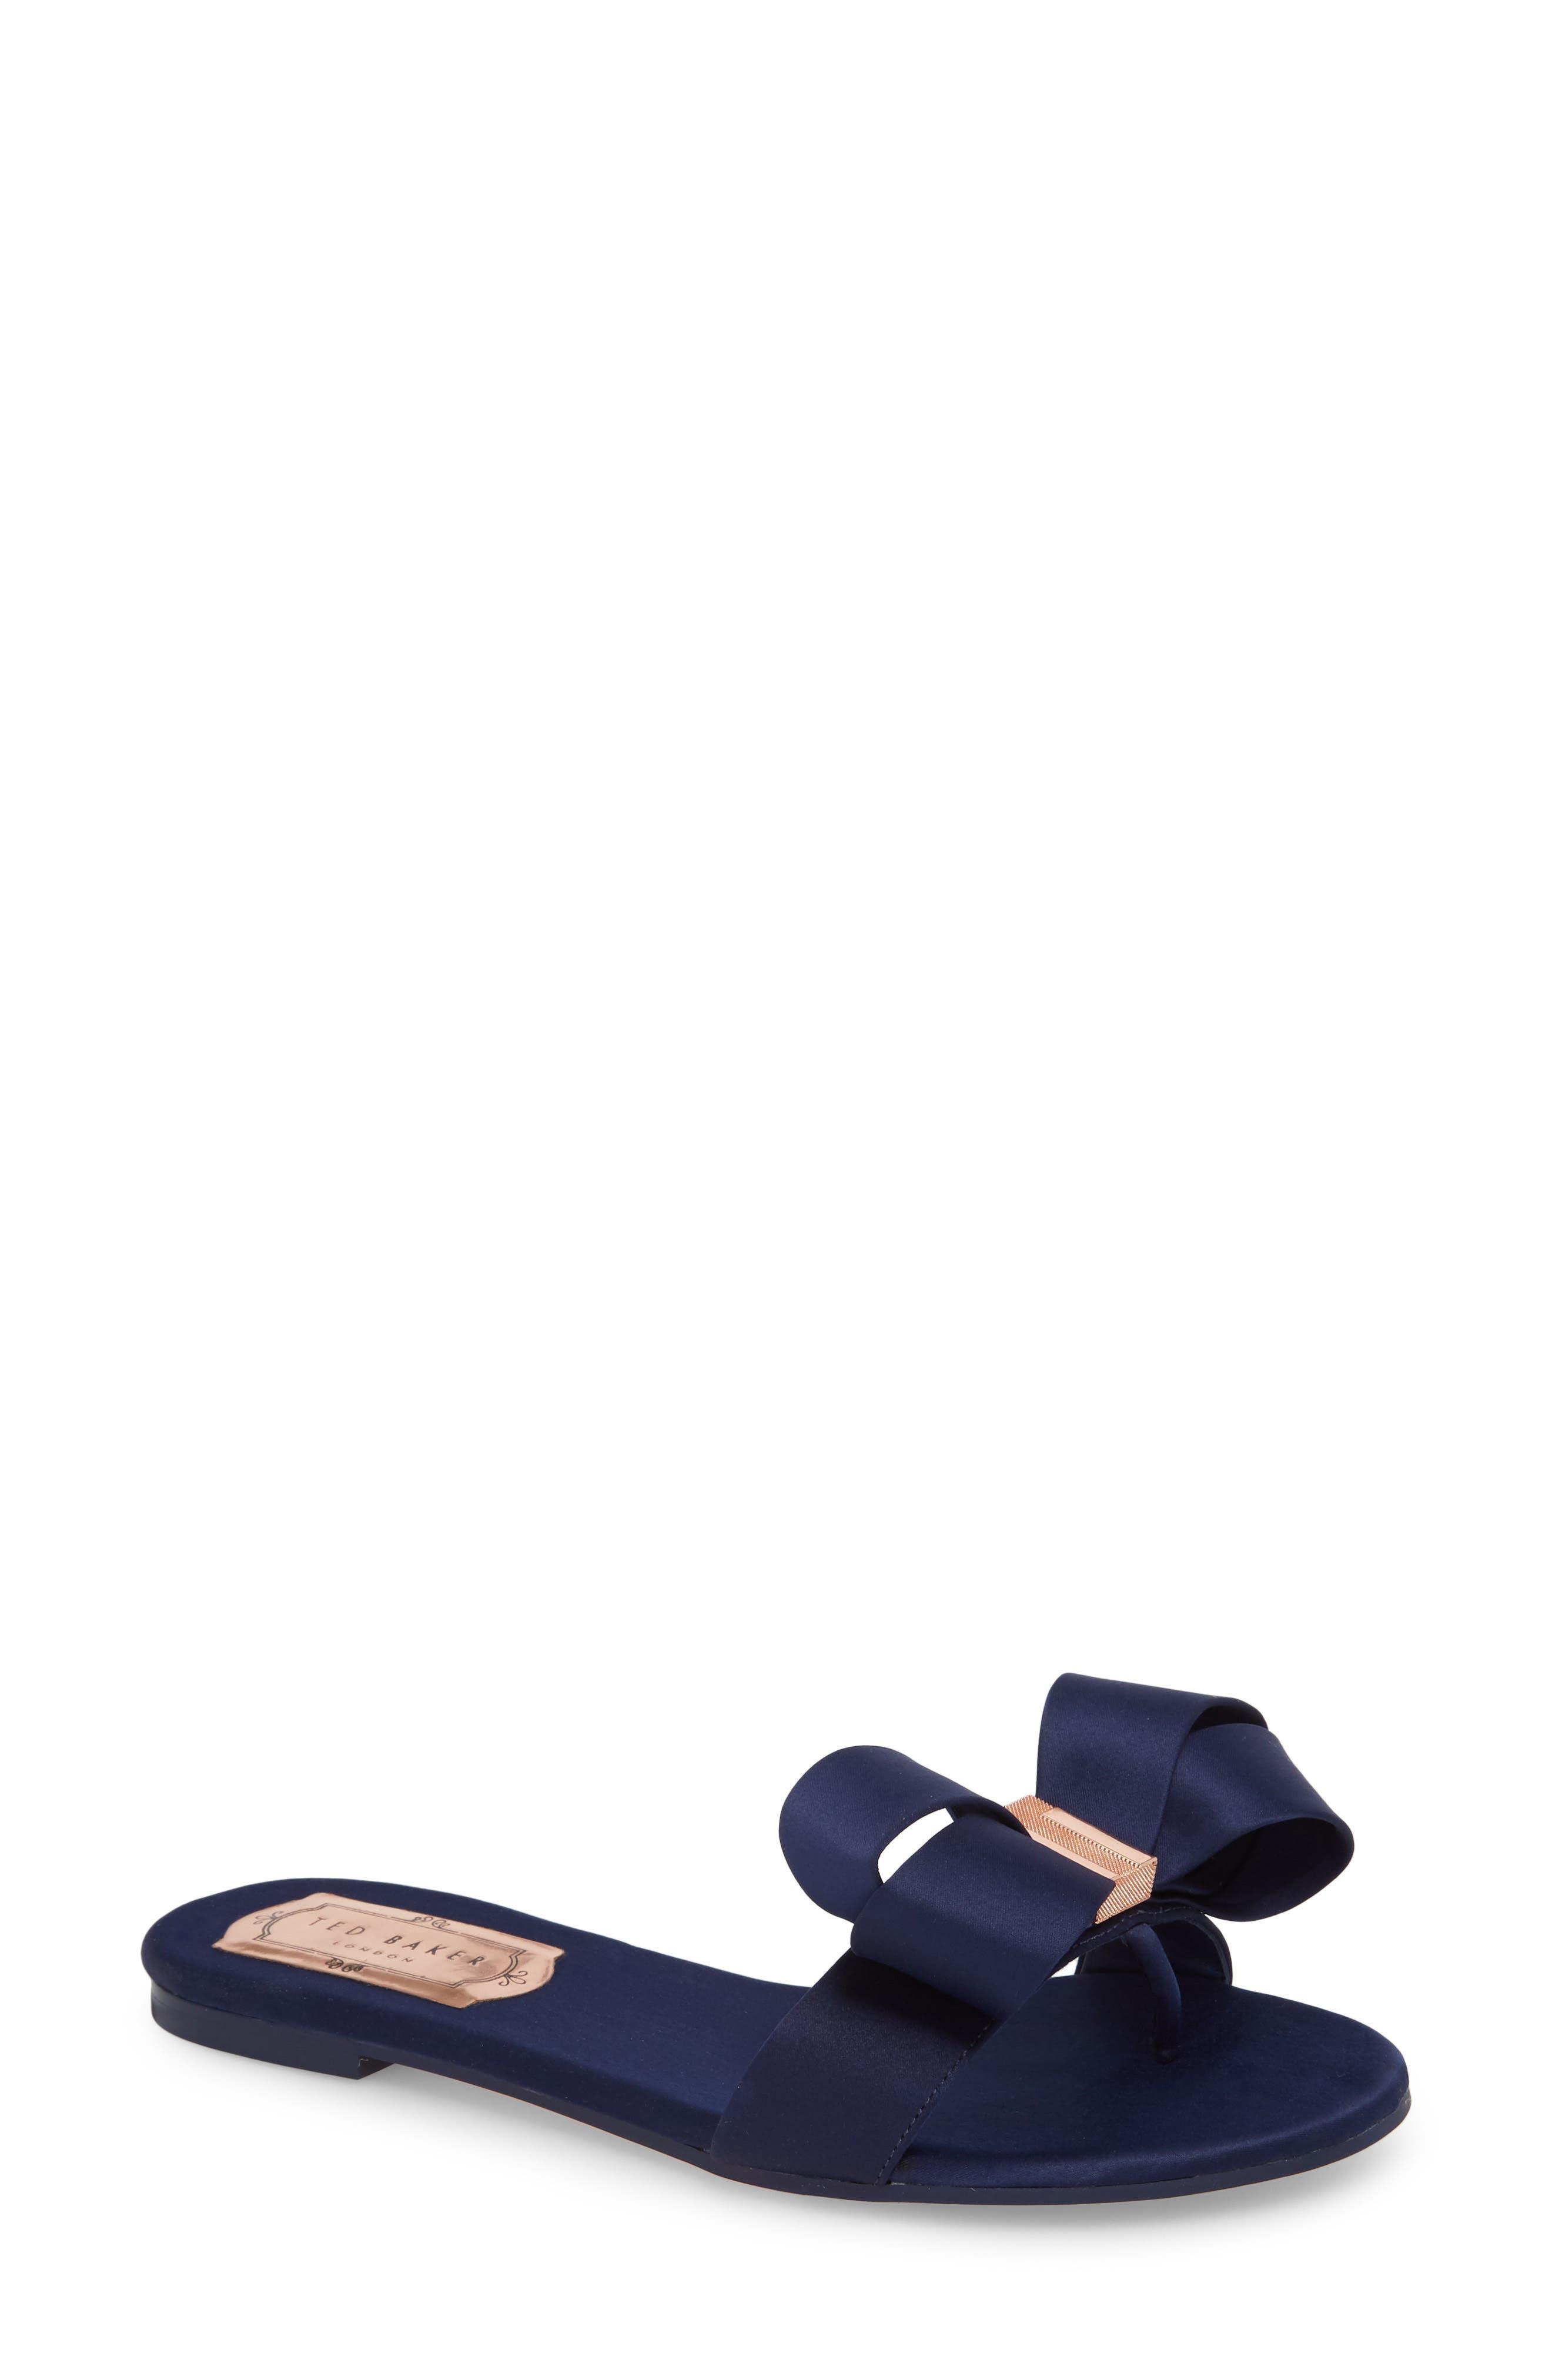 Slide Sandal,                         Main,                         color, 417